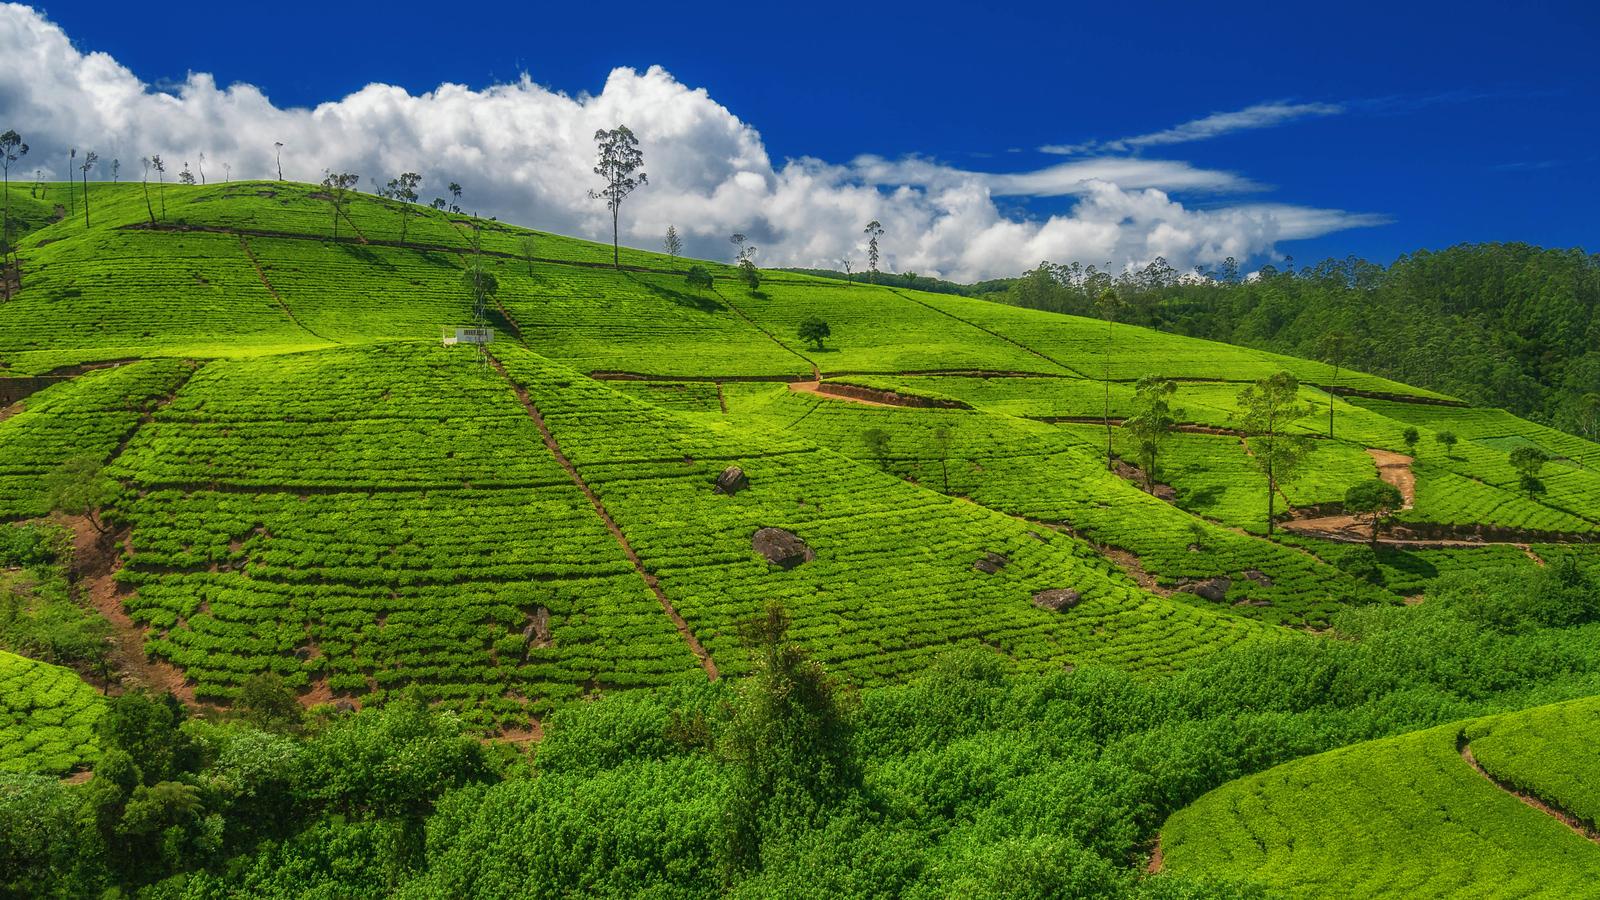 The sprawling tea fields of Ella, Sri Lanka